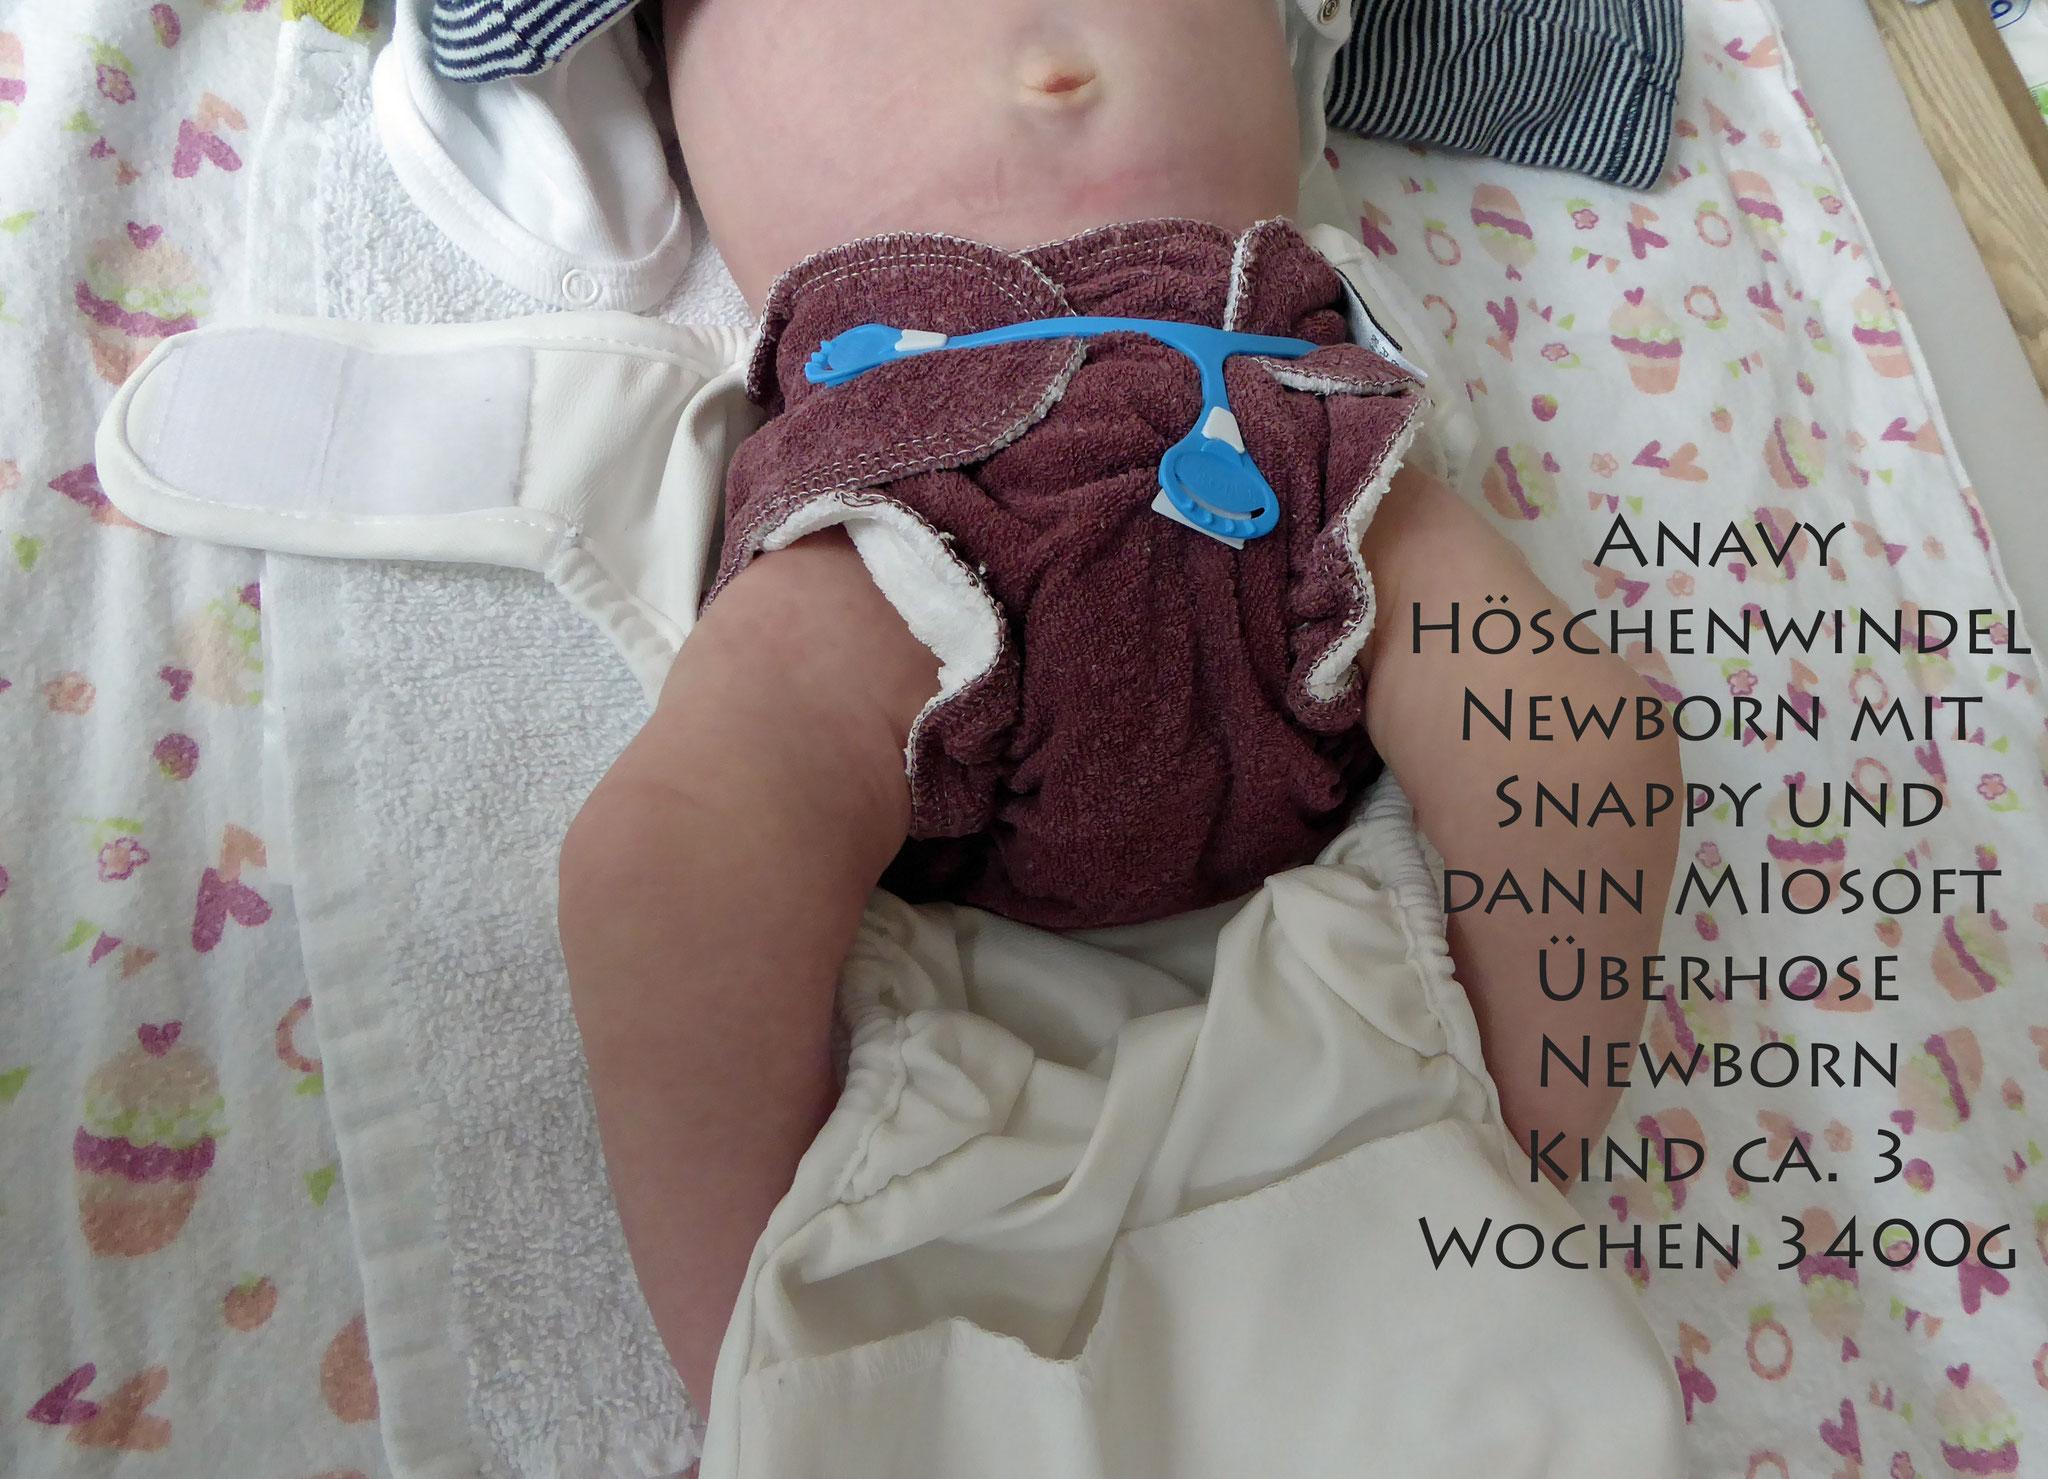 Anavy Newborn Snappy